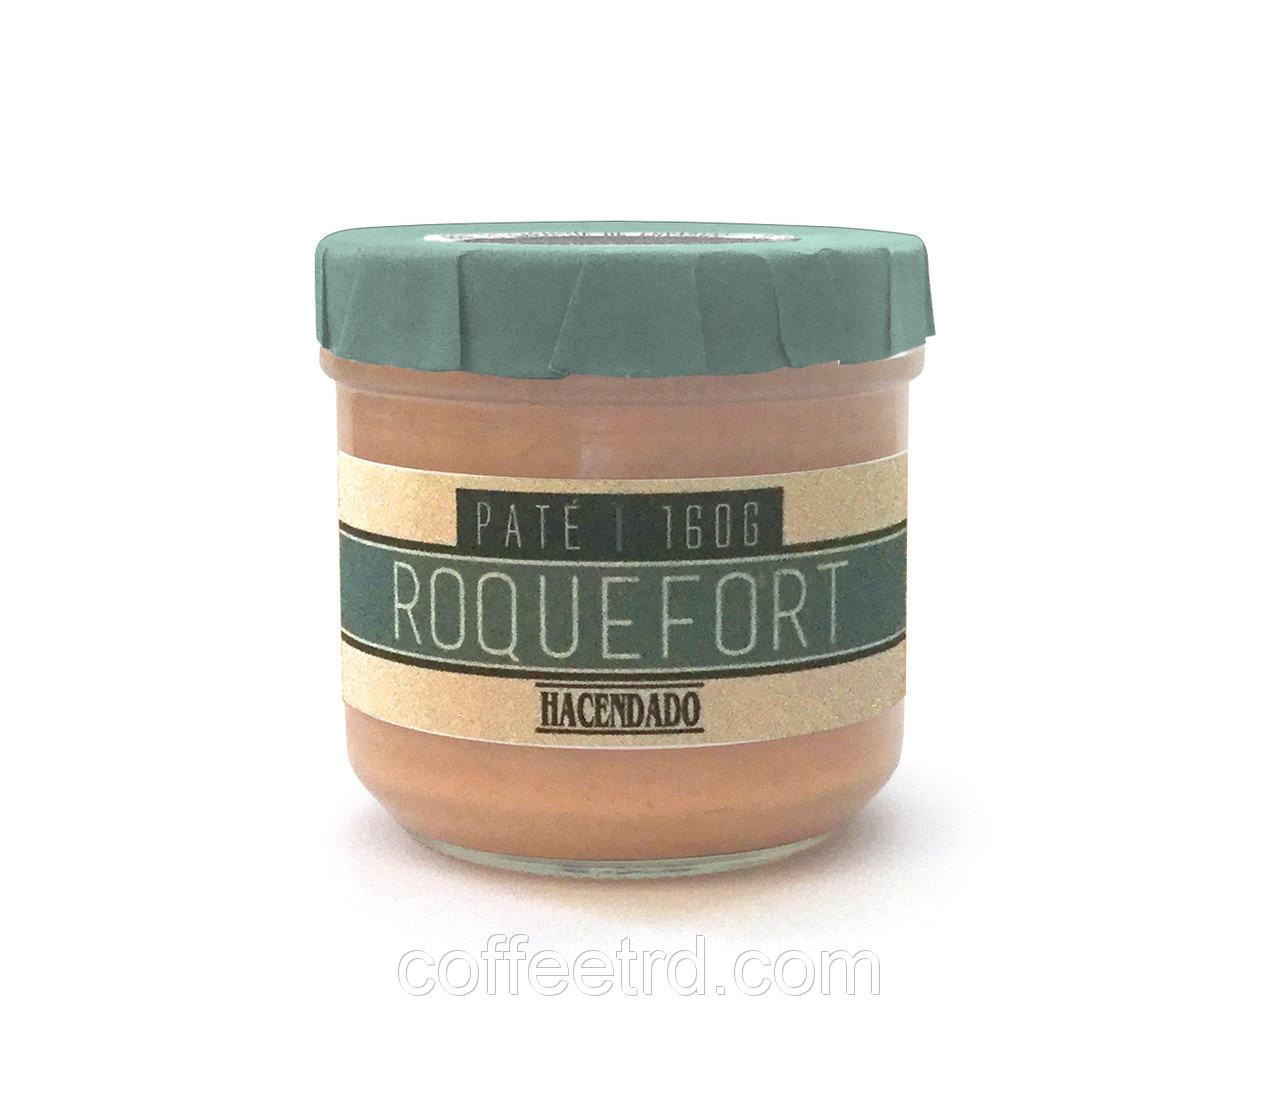 Hacendado Pate Roquefort Хакендадо пате покфорт паштет с сыром рокфор , 160г.